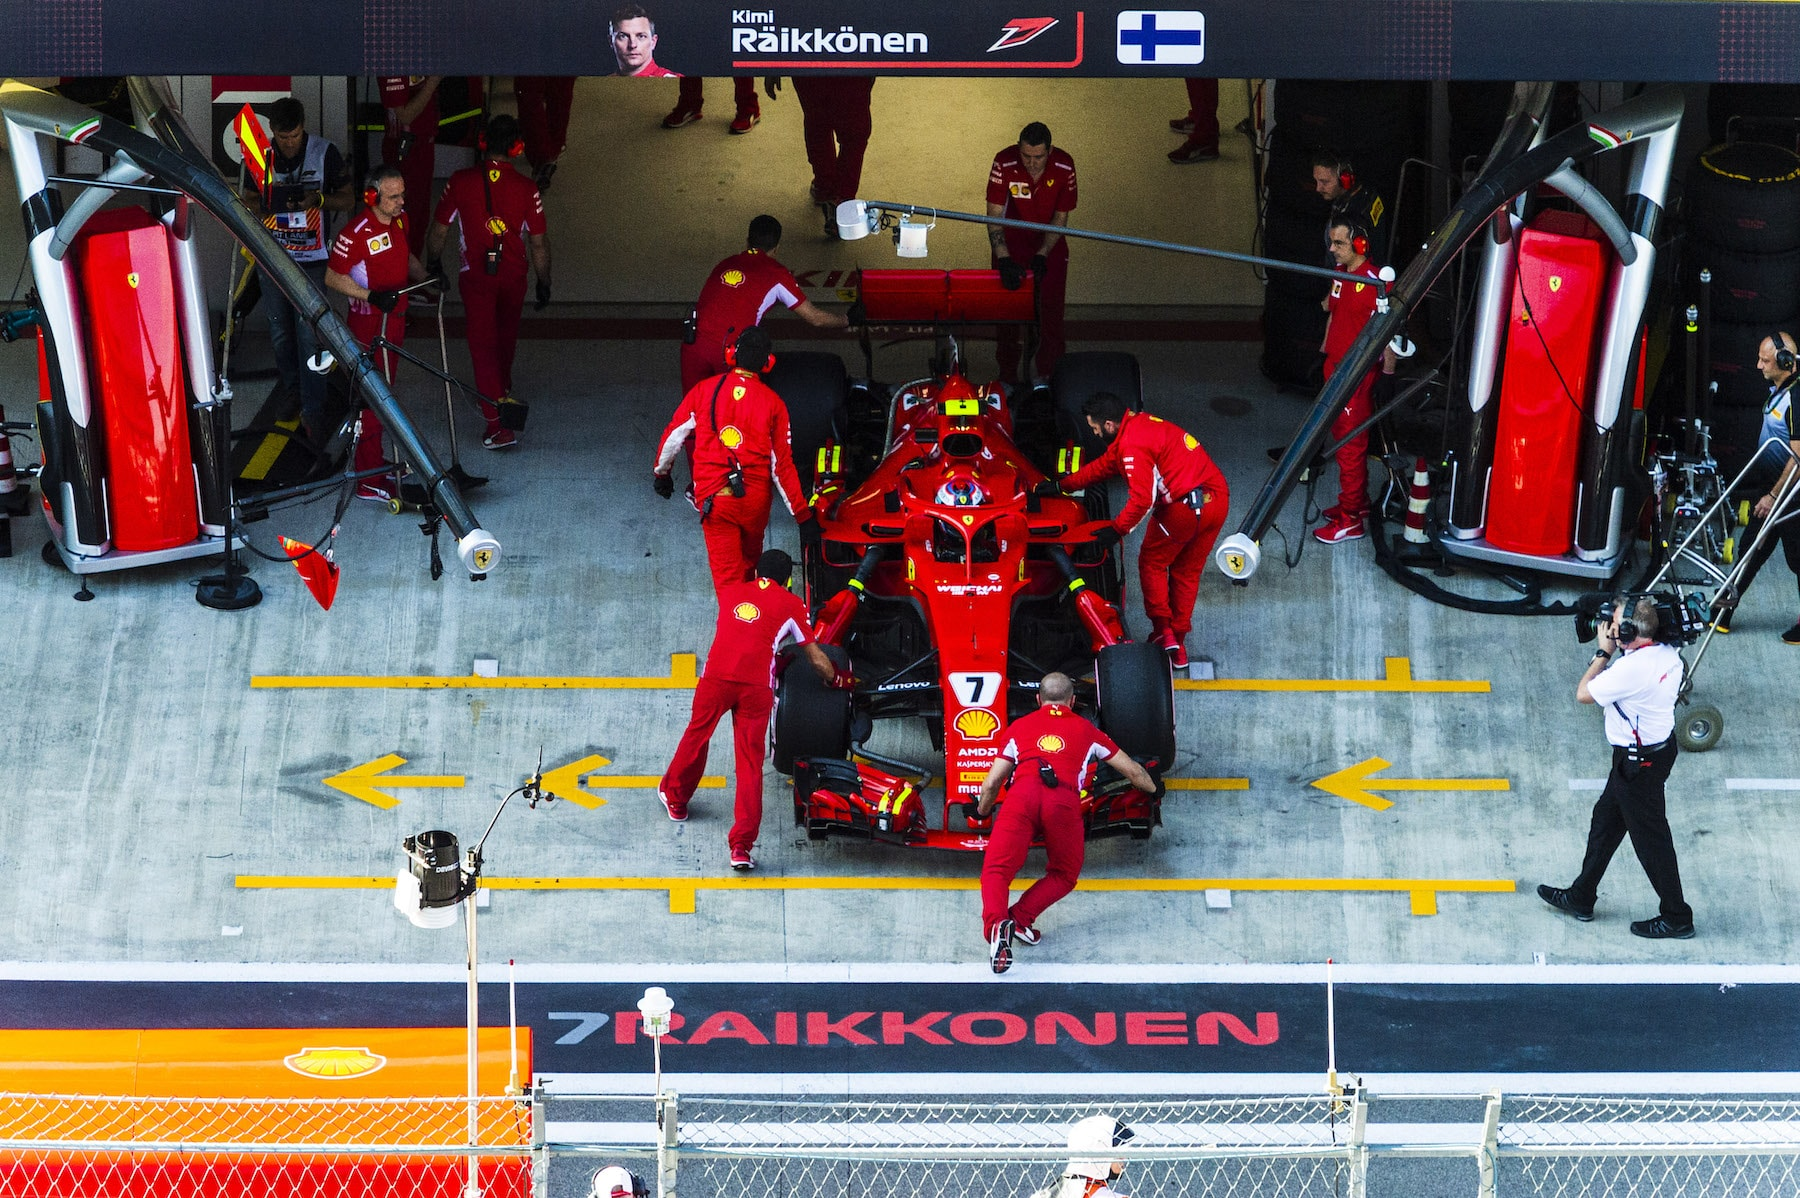 2018 Kimi Raikkonen | Ferrari SF71H | 2018 Russian GP Q3 2 copy.jpg